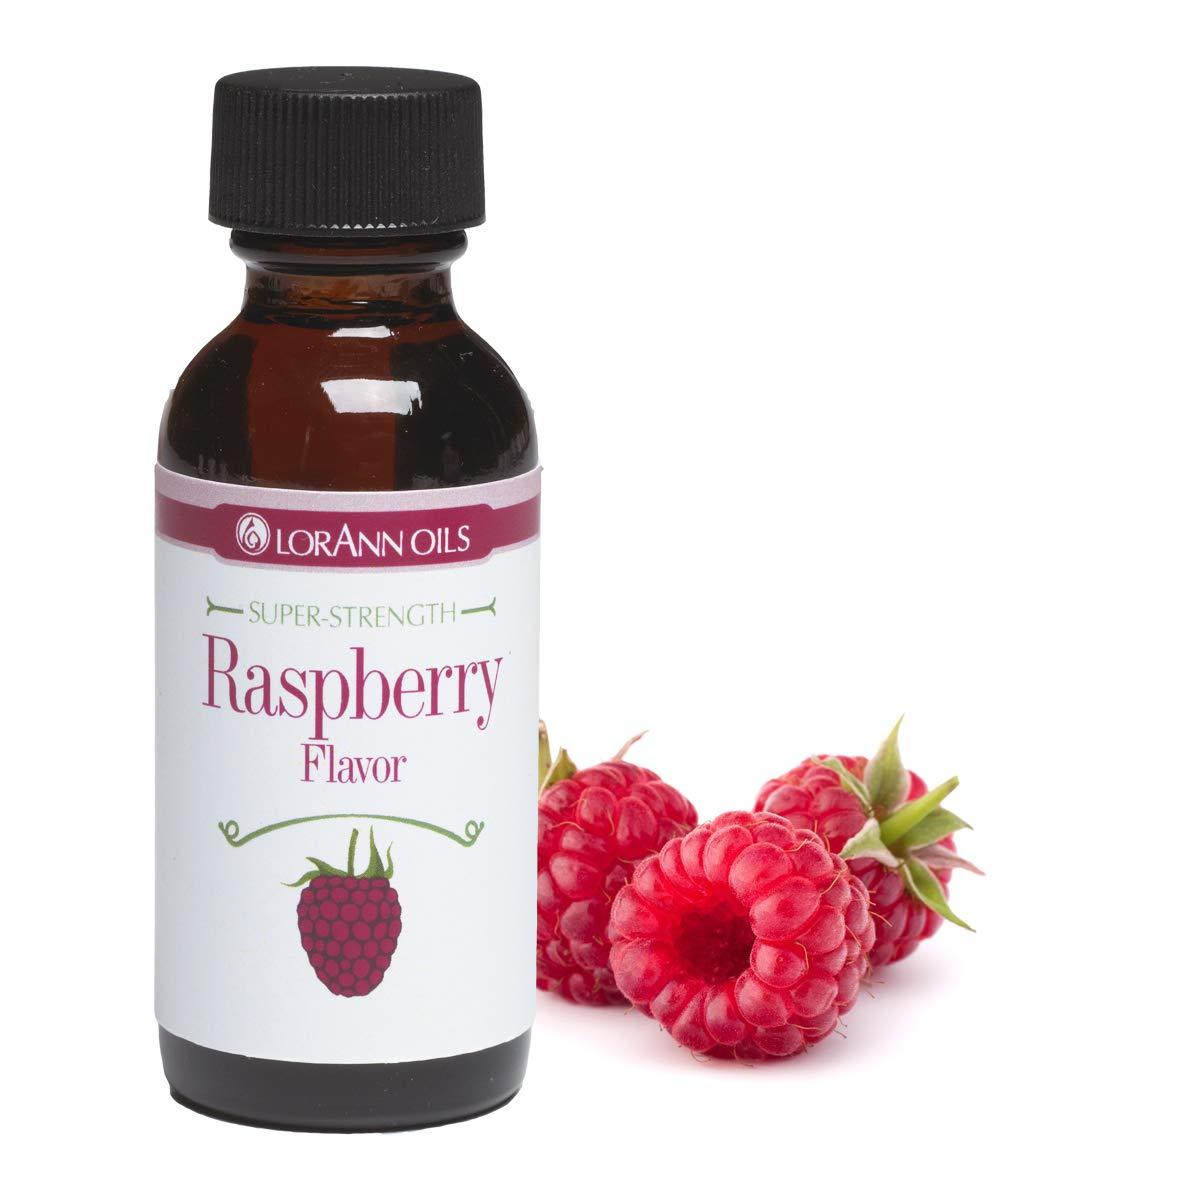 LorAnn Raspberry Super Strength Flavor, 1 ounce bottle